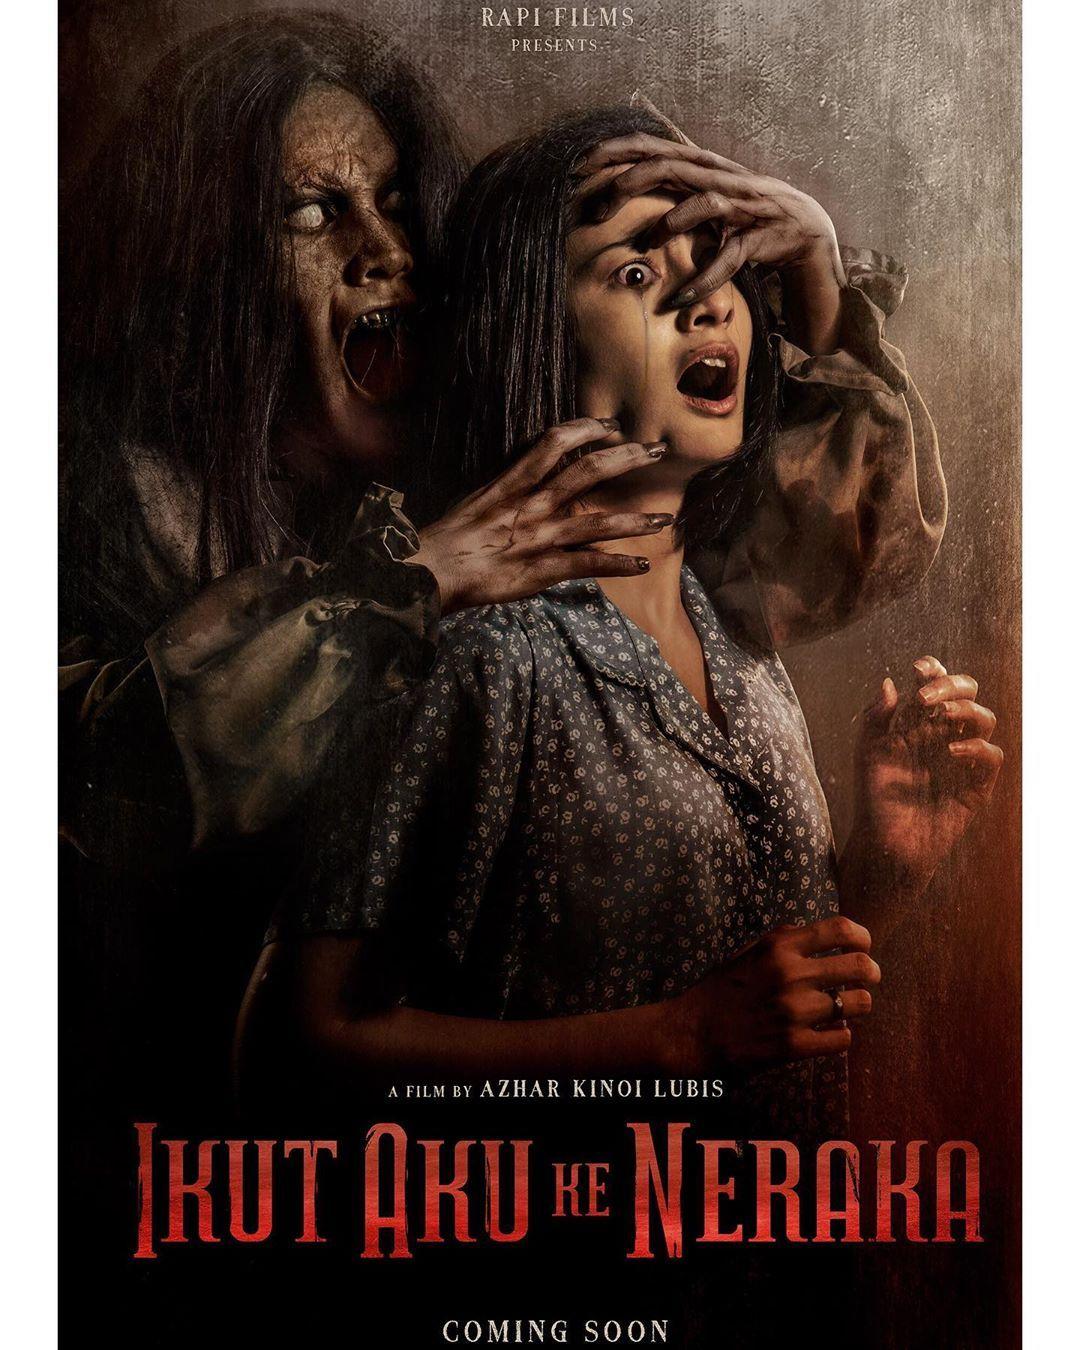 Ikut Aku Ke Neraka 2019 Film Horor Film Poster Film